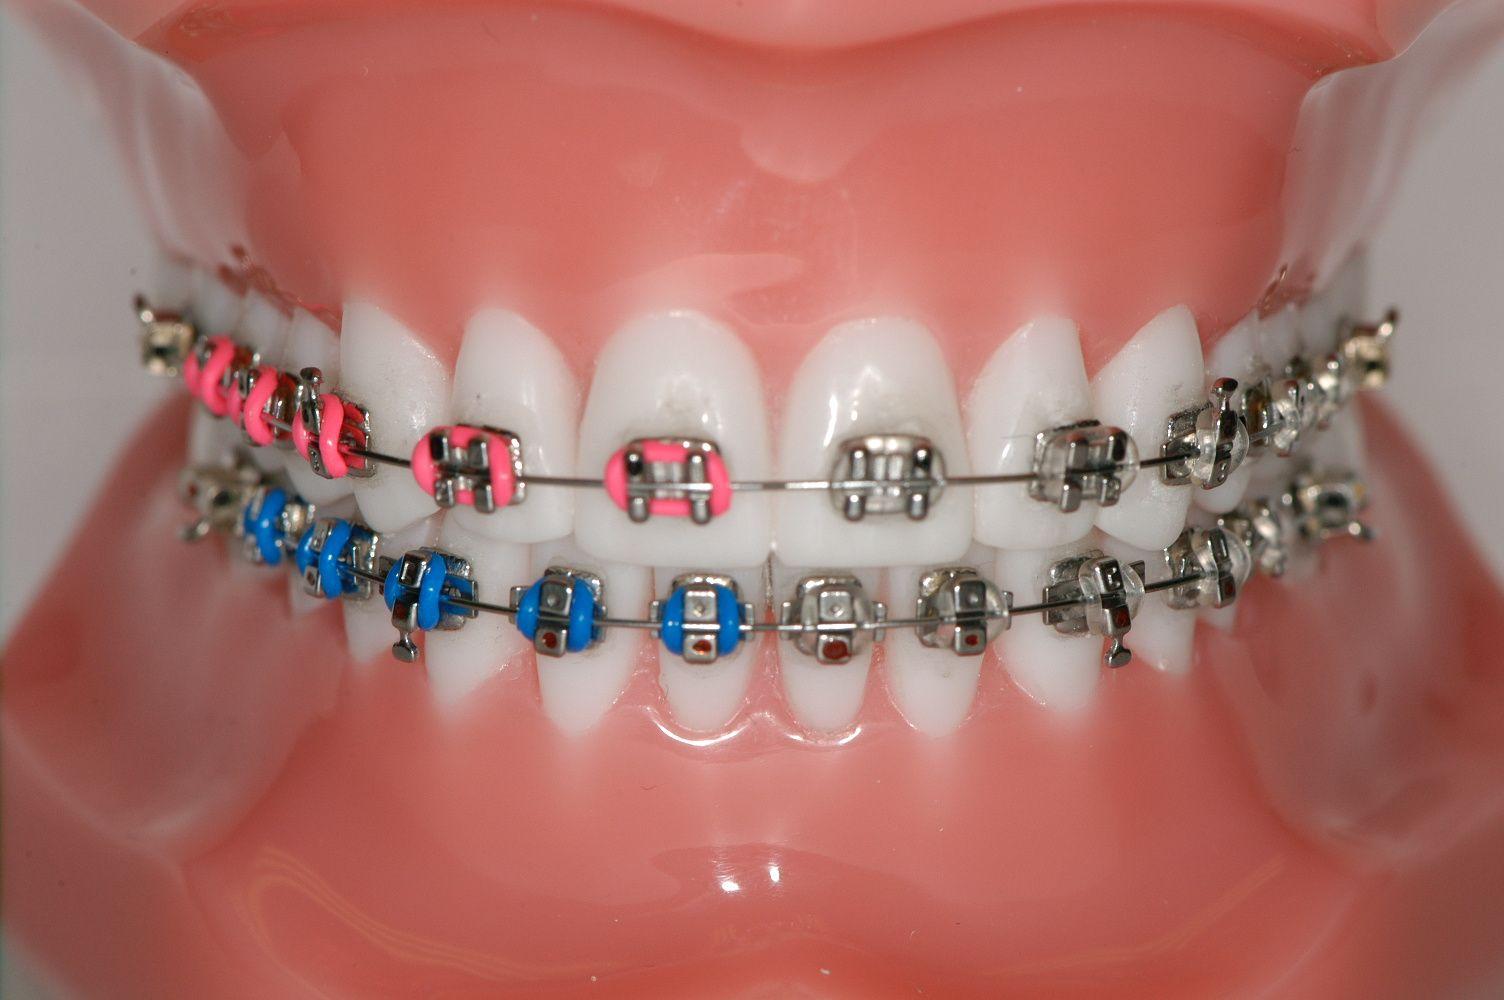 Shocking Pink - Blue   Braces Colors   Pinterest   Pink blue and ...